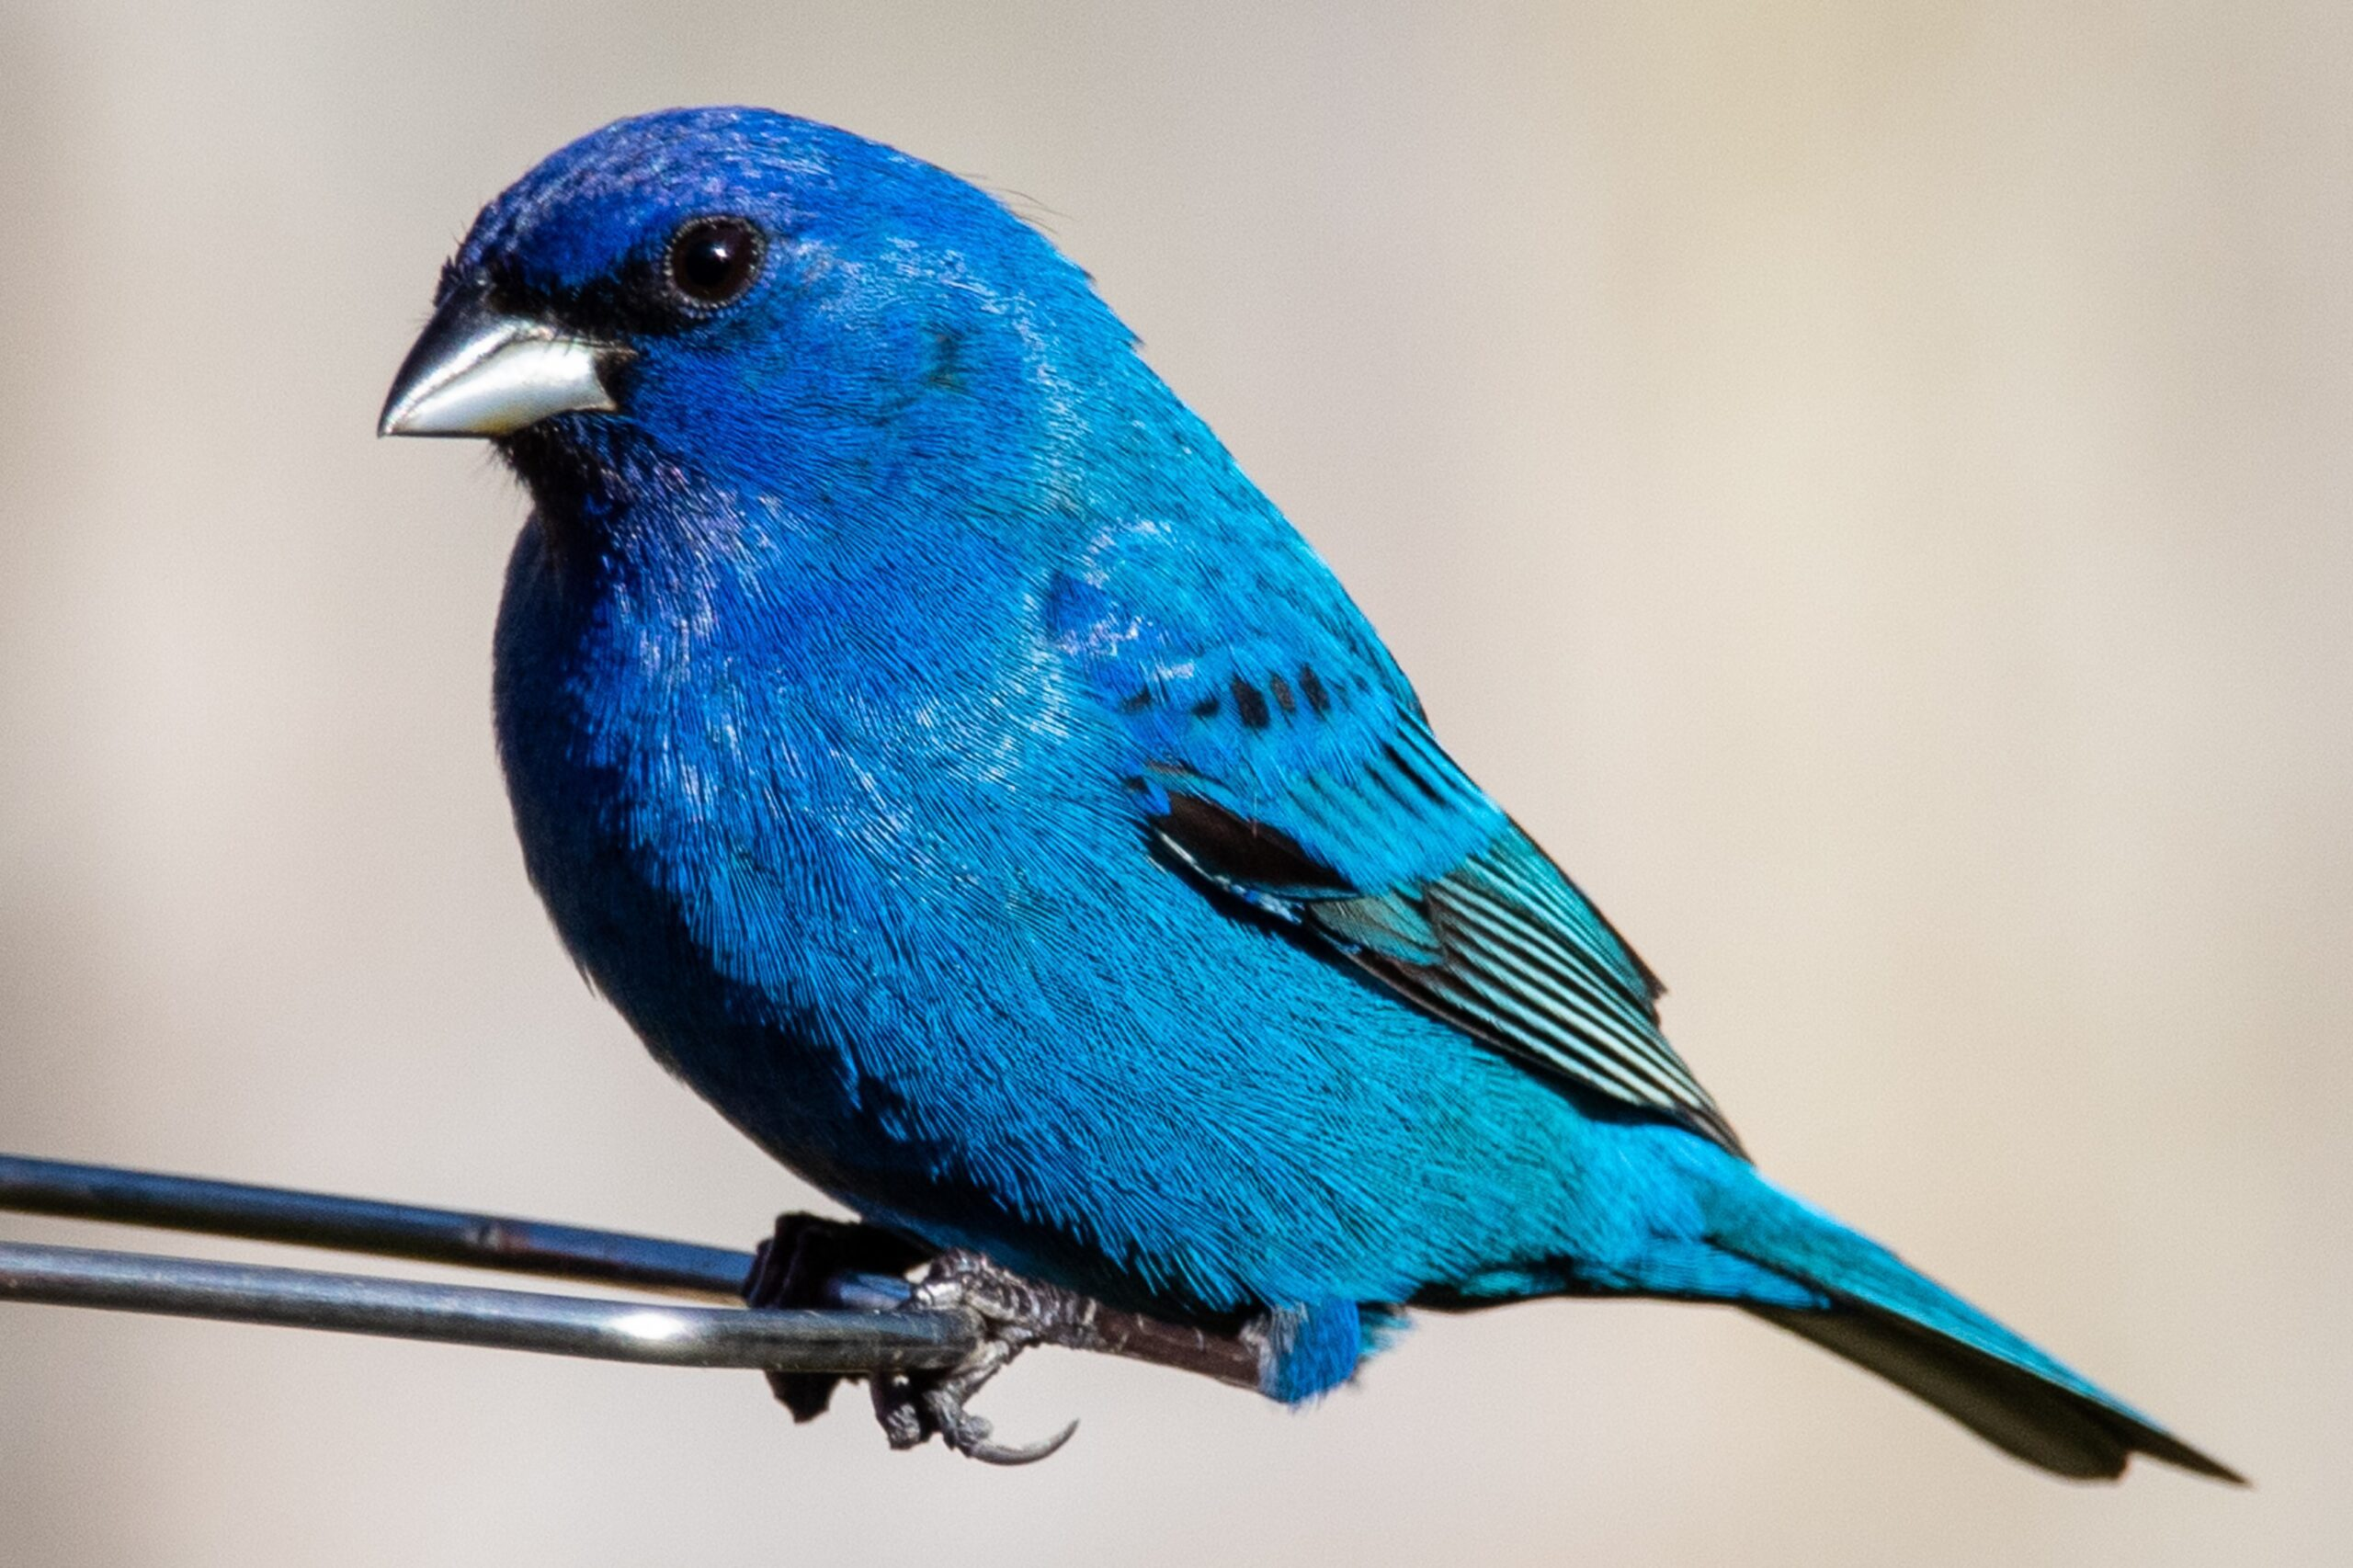 Bluebird on branch by Joshua j Cotten on Unsplash